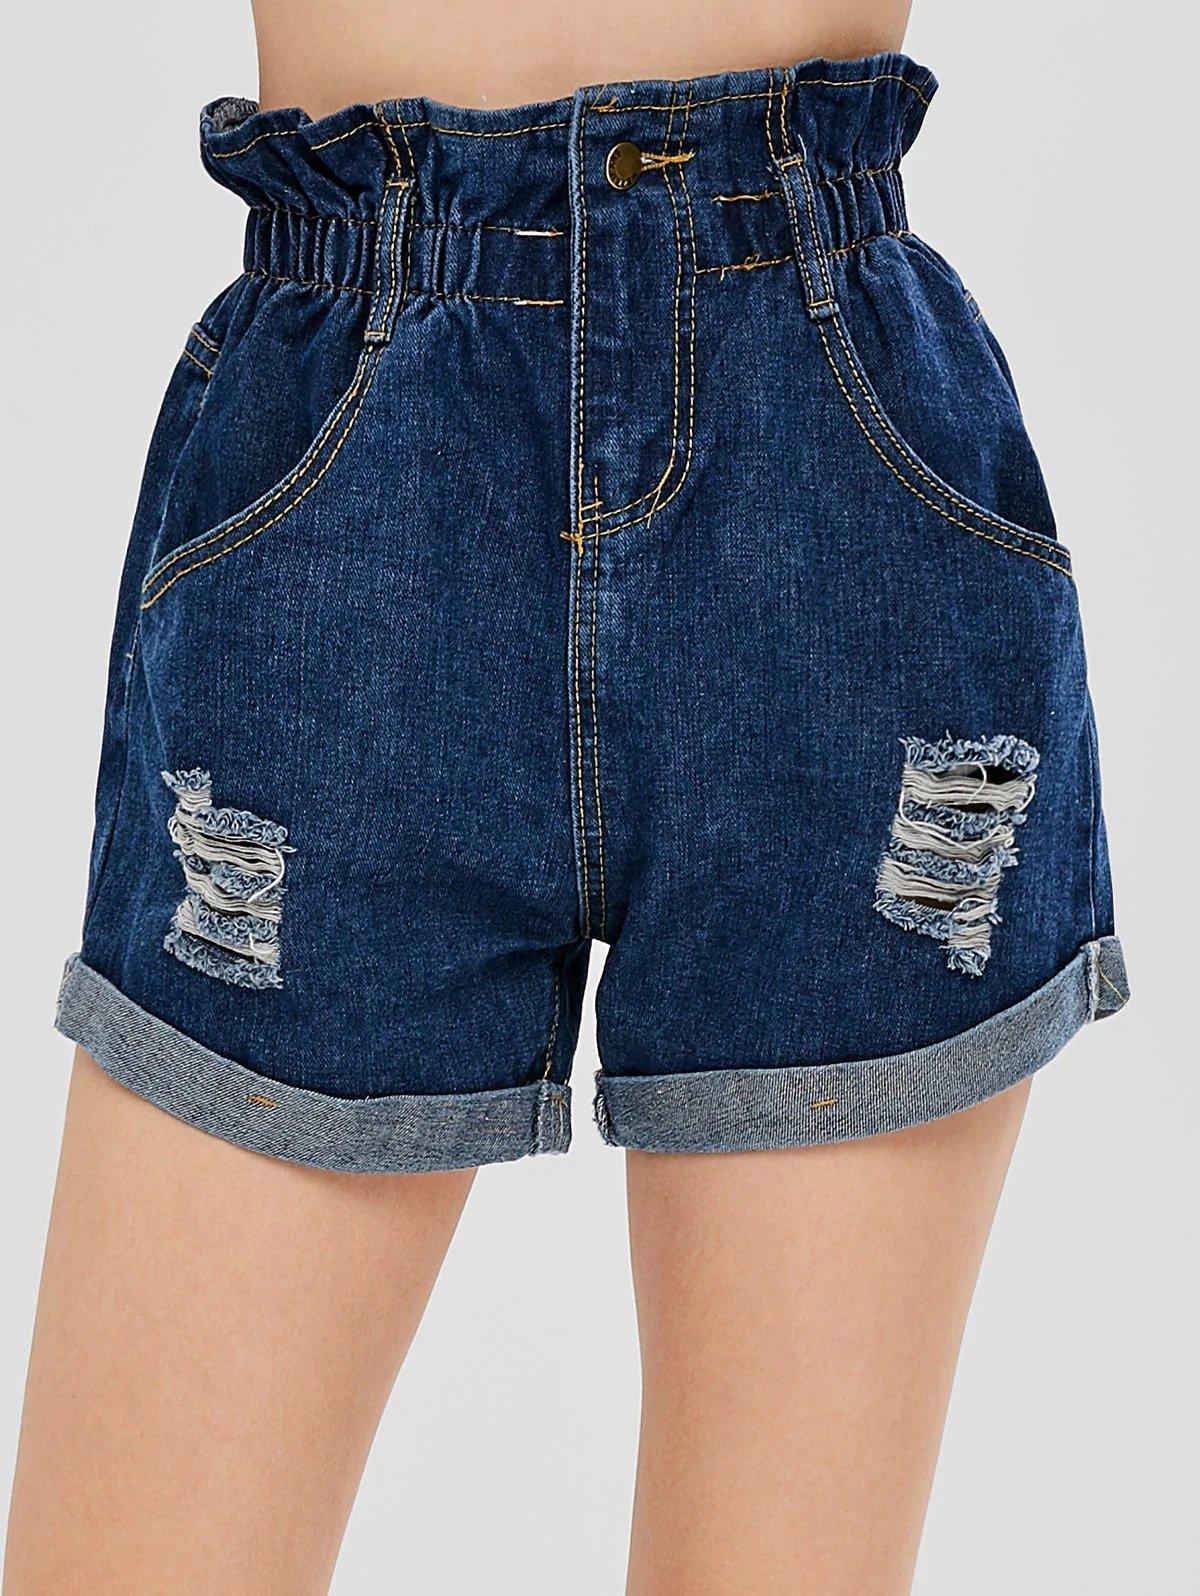 Ripped Denim Cuffed Shorts - Denim Dark Blue